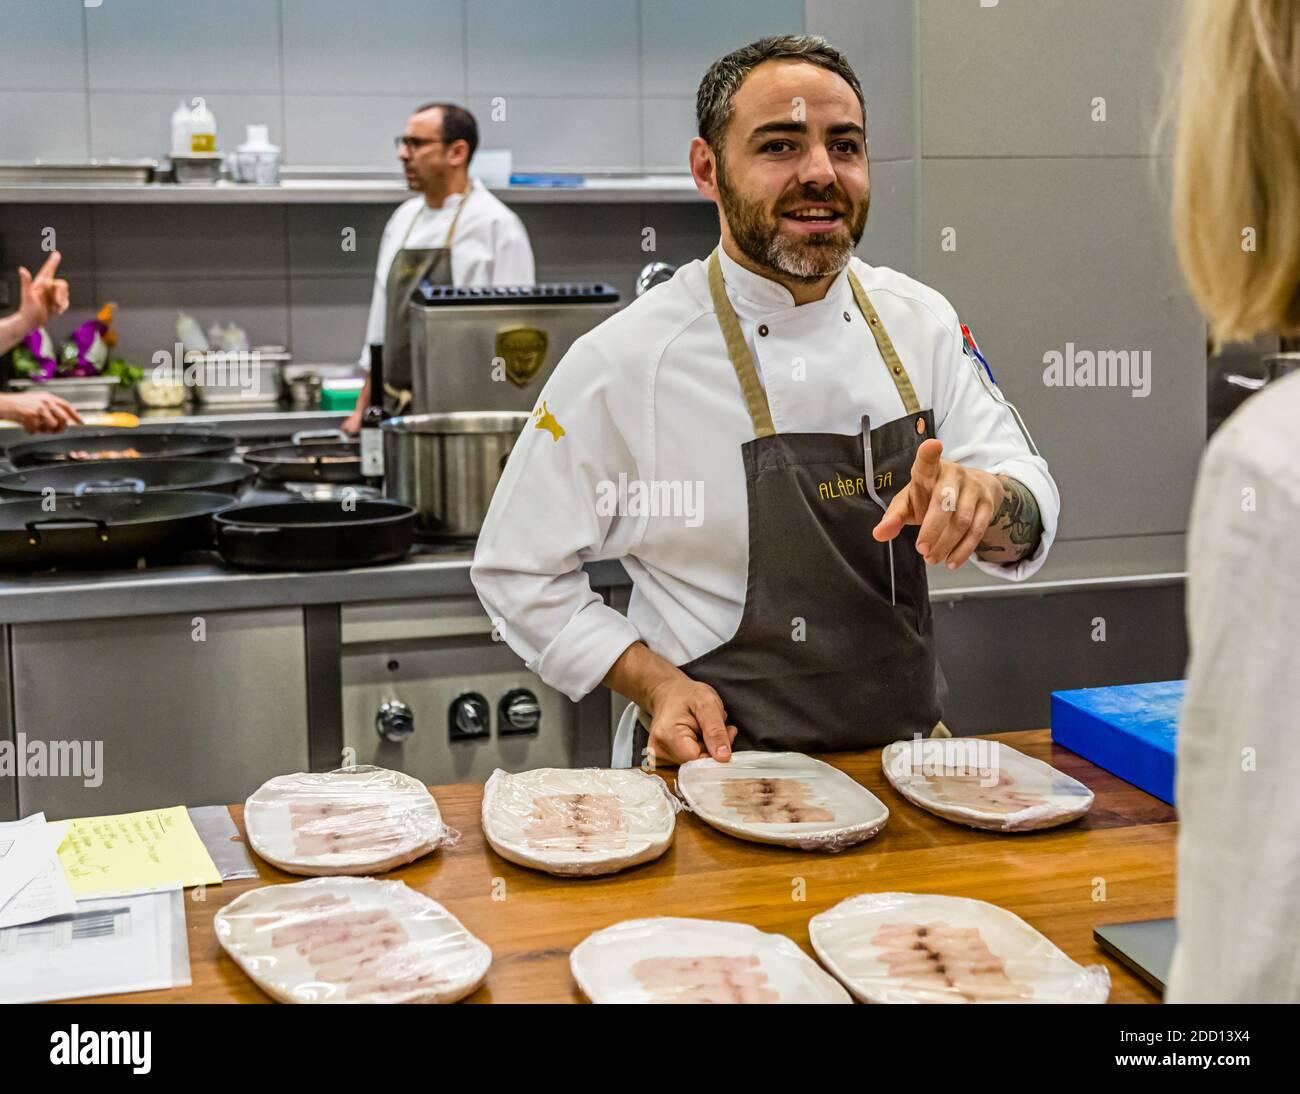 Food journalist Angela Berg in conversation with chef Abraham Artigas of Alabriga Hotel, Sant Feliu de Guíxols, Spain Stock Photo